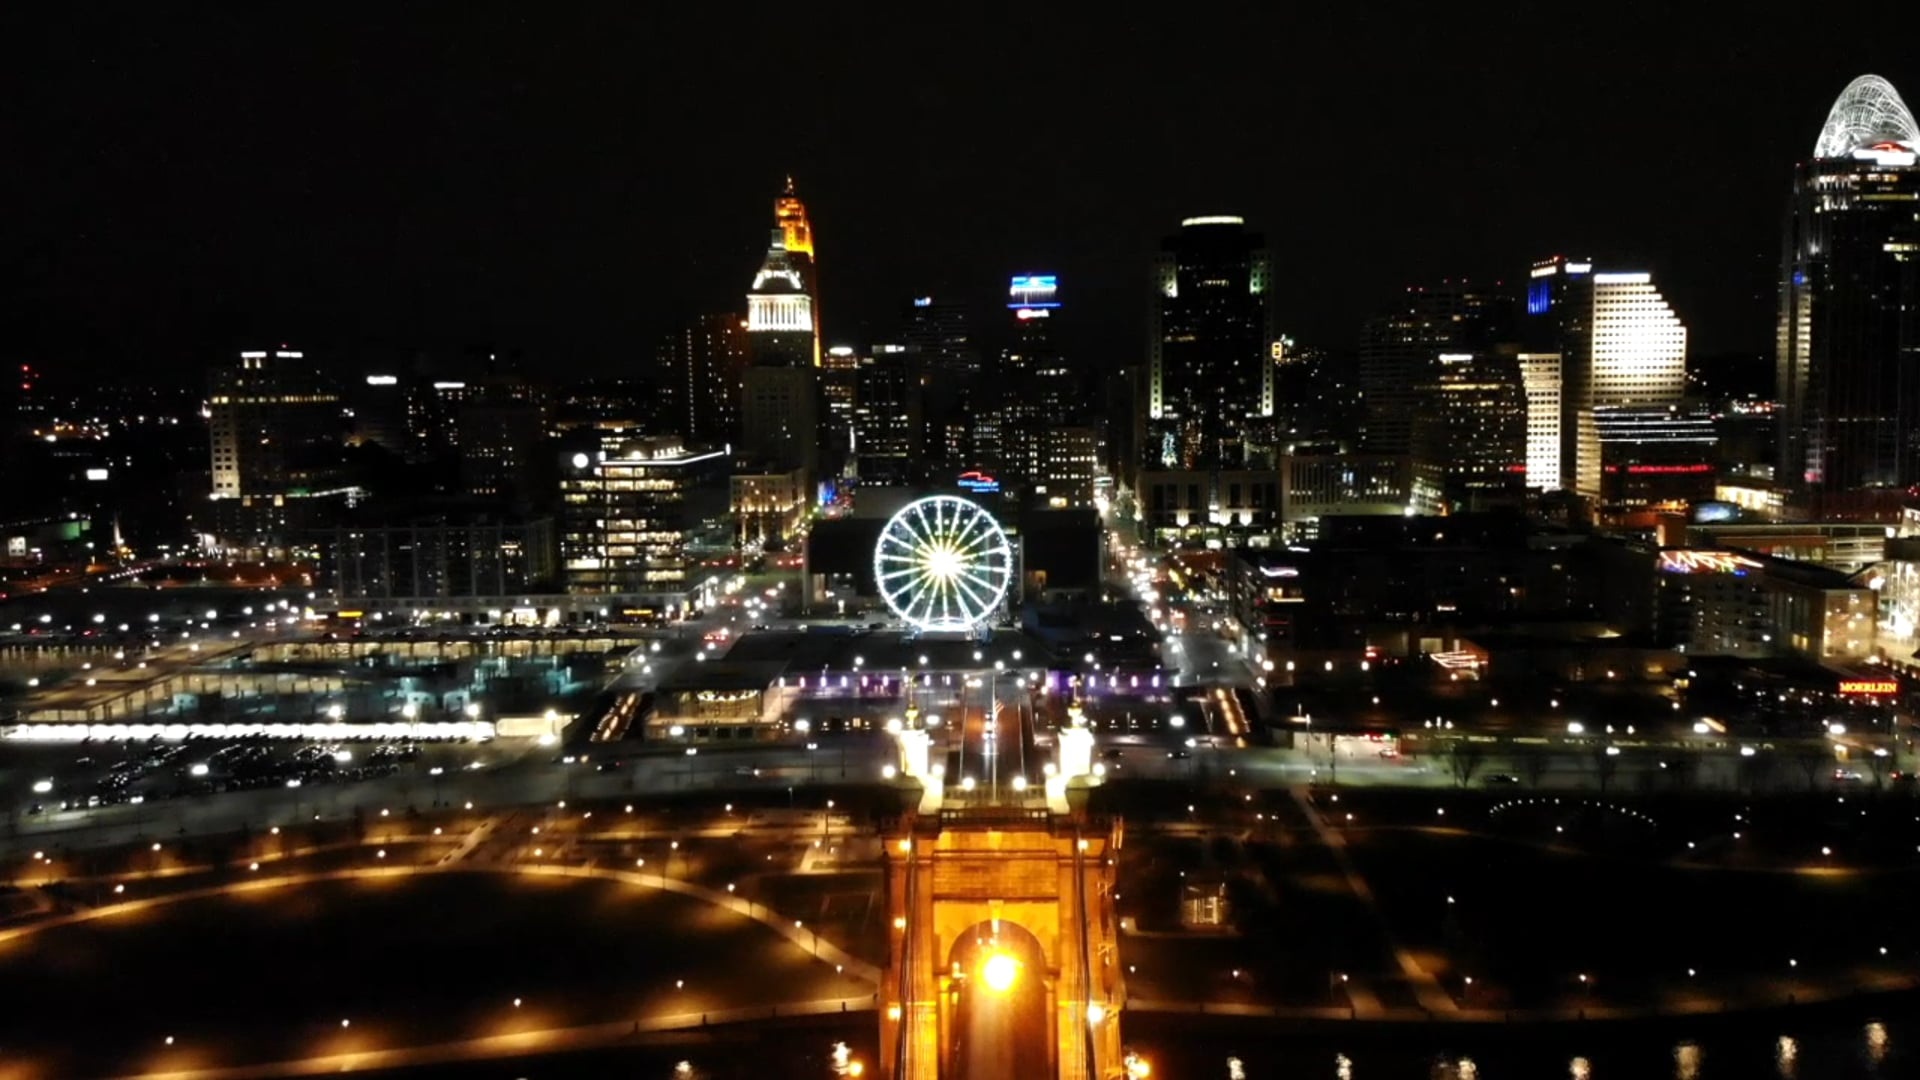 Nati' Skyline at Night